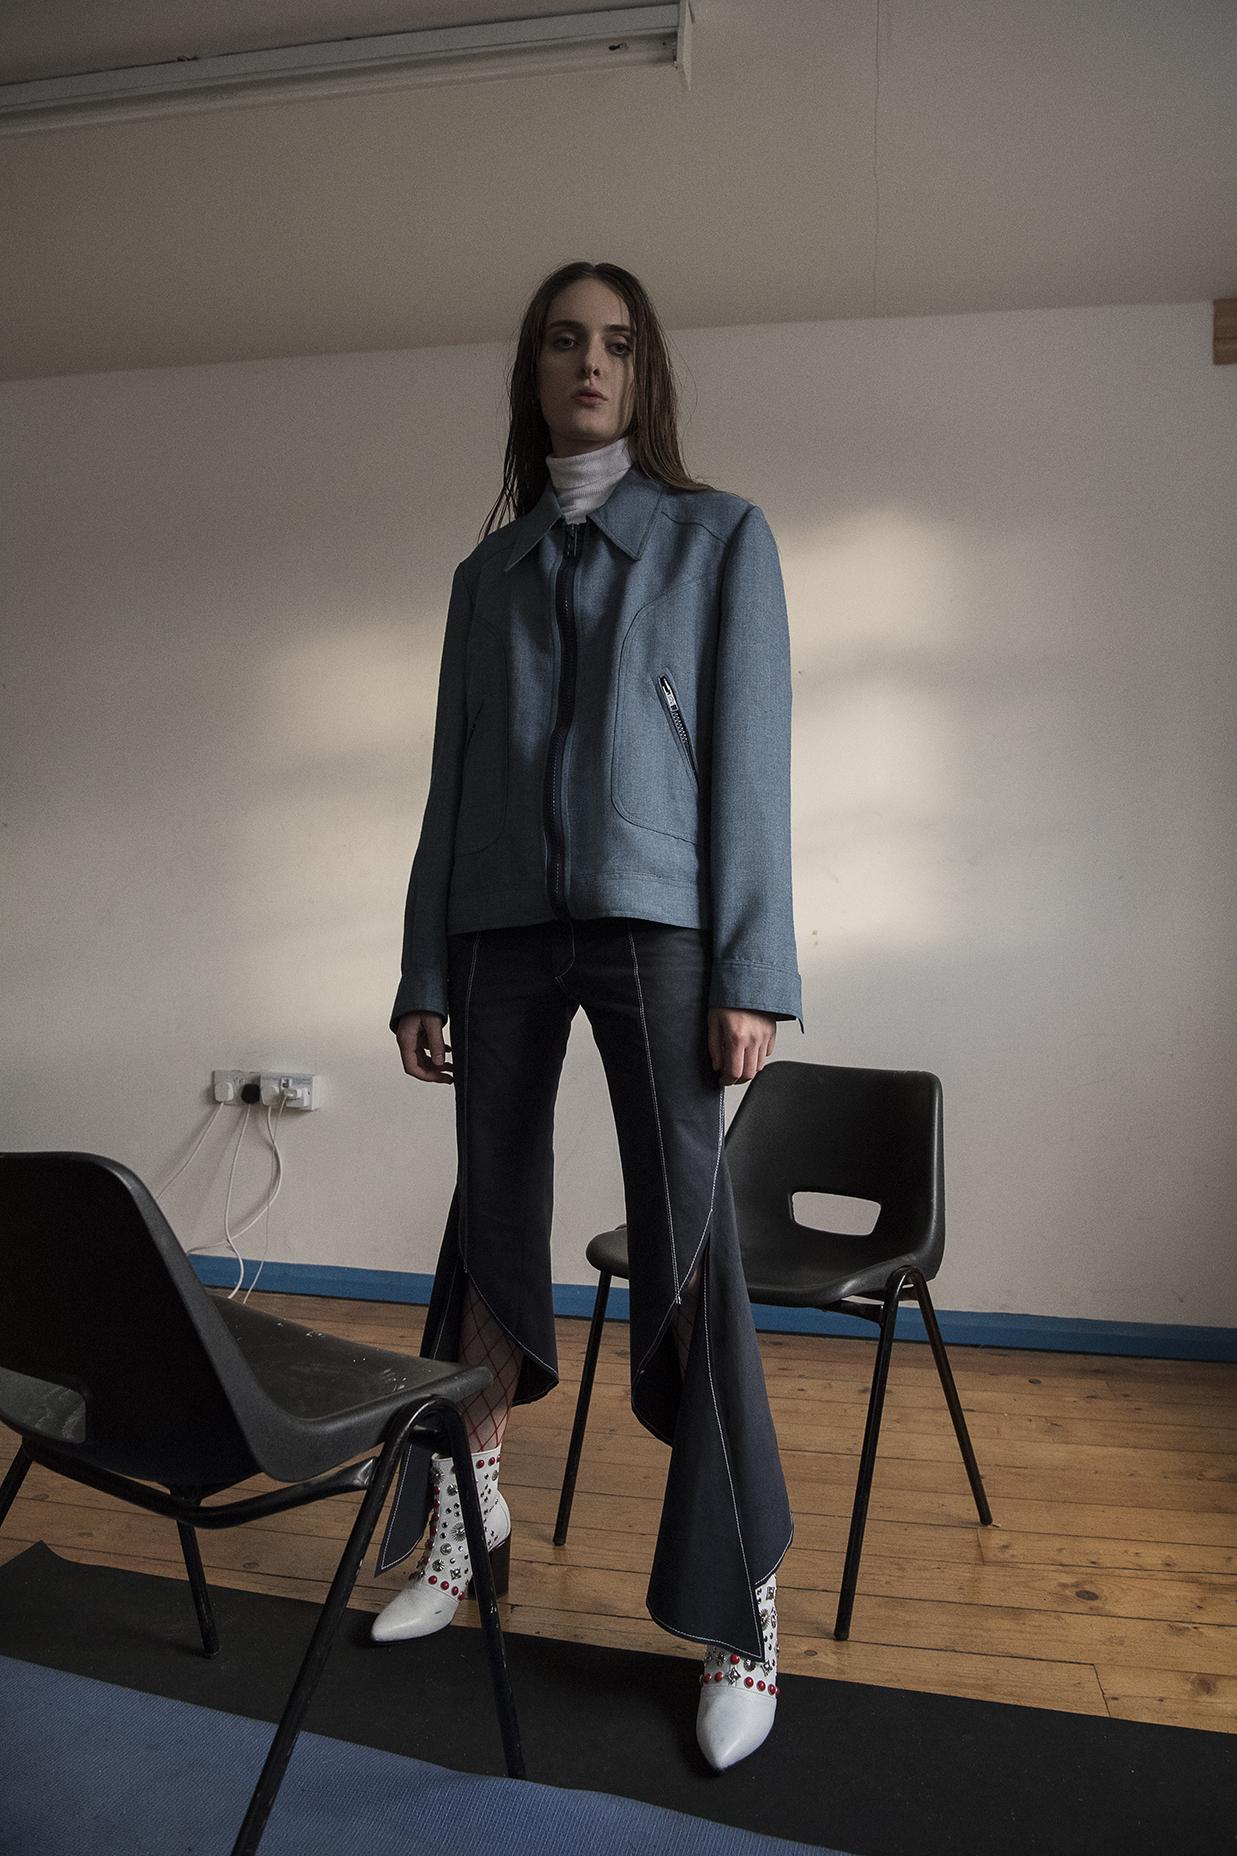 denim jacket  the market cartel  turtleneck  vintage  trousers  JH zane  boots  toga pulla